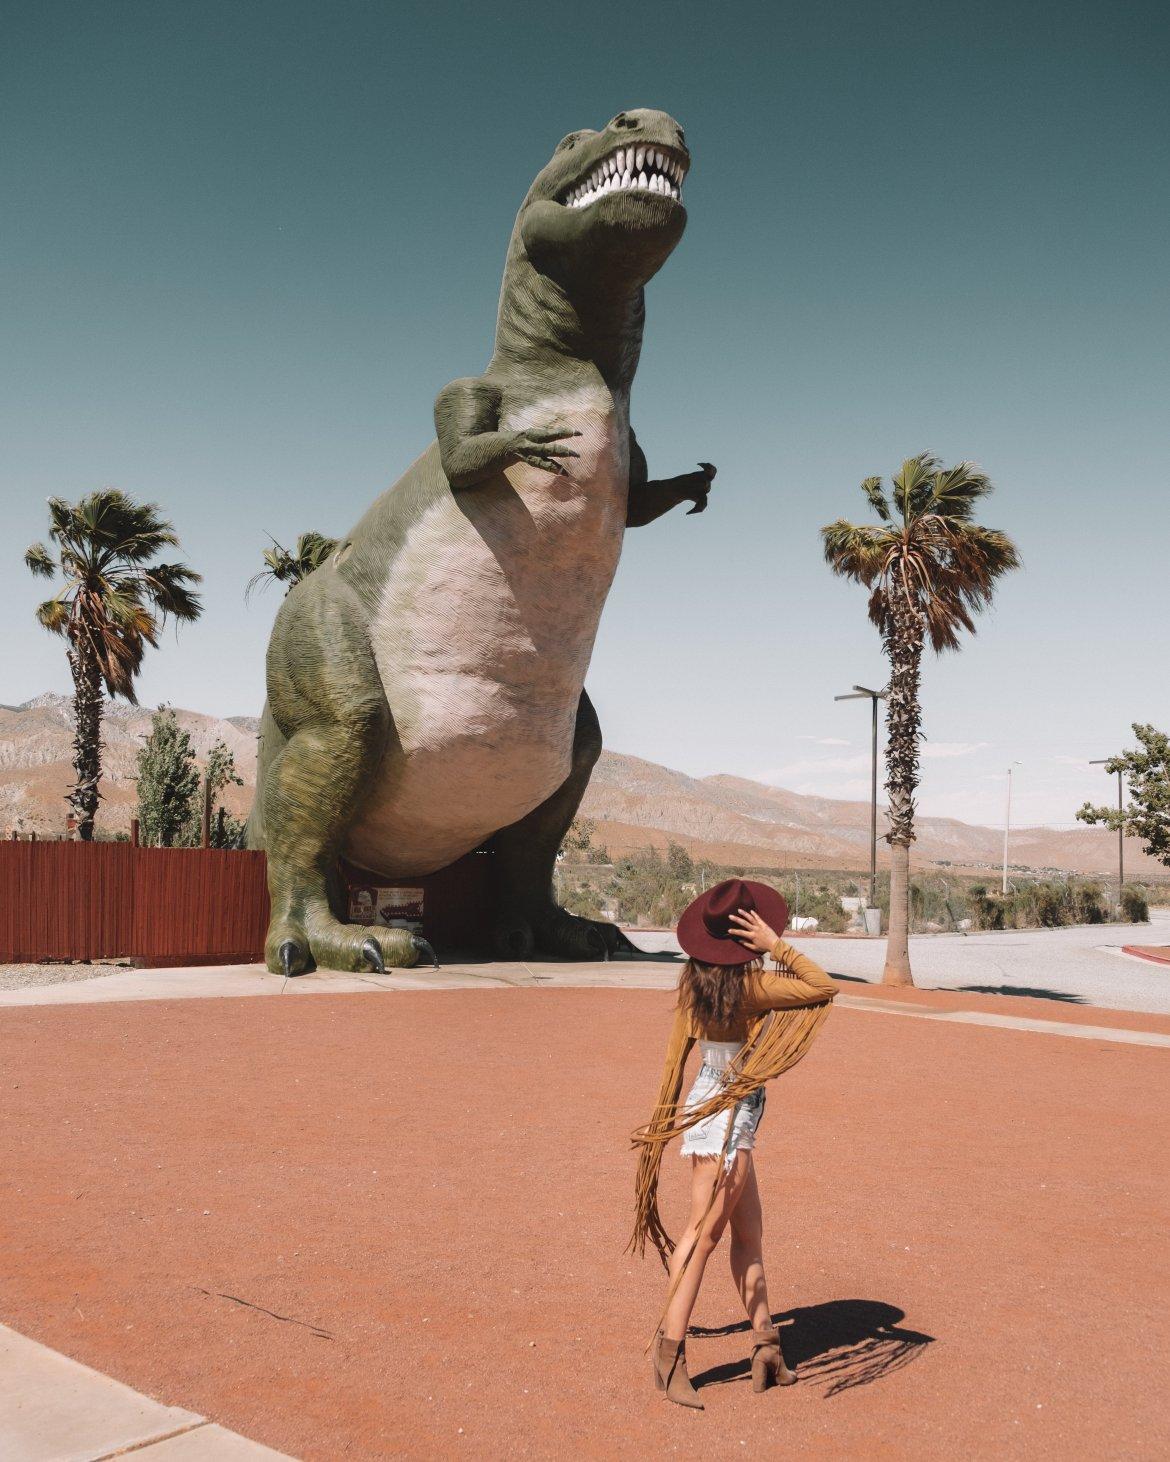 cabezon dinosaurs